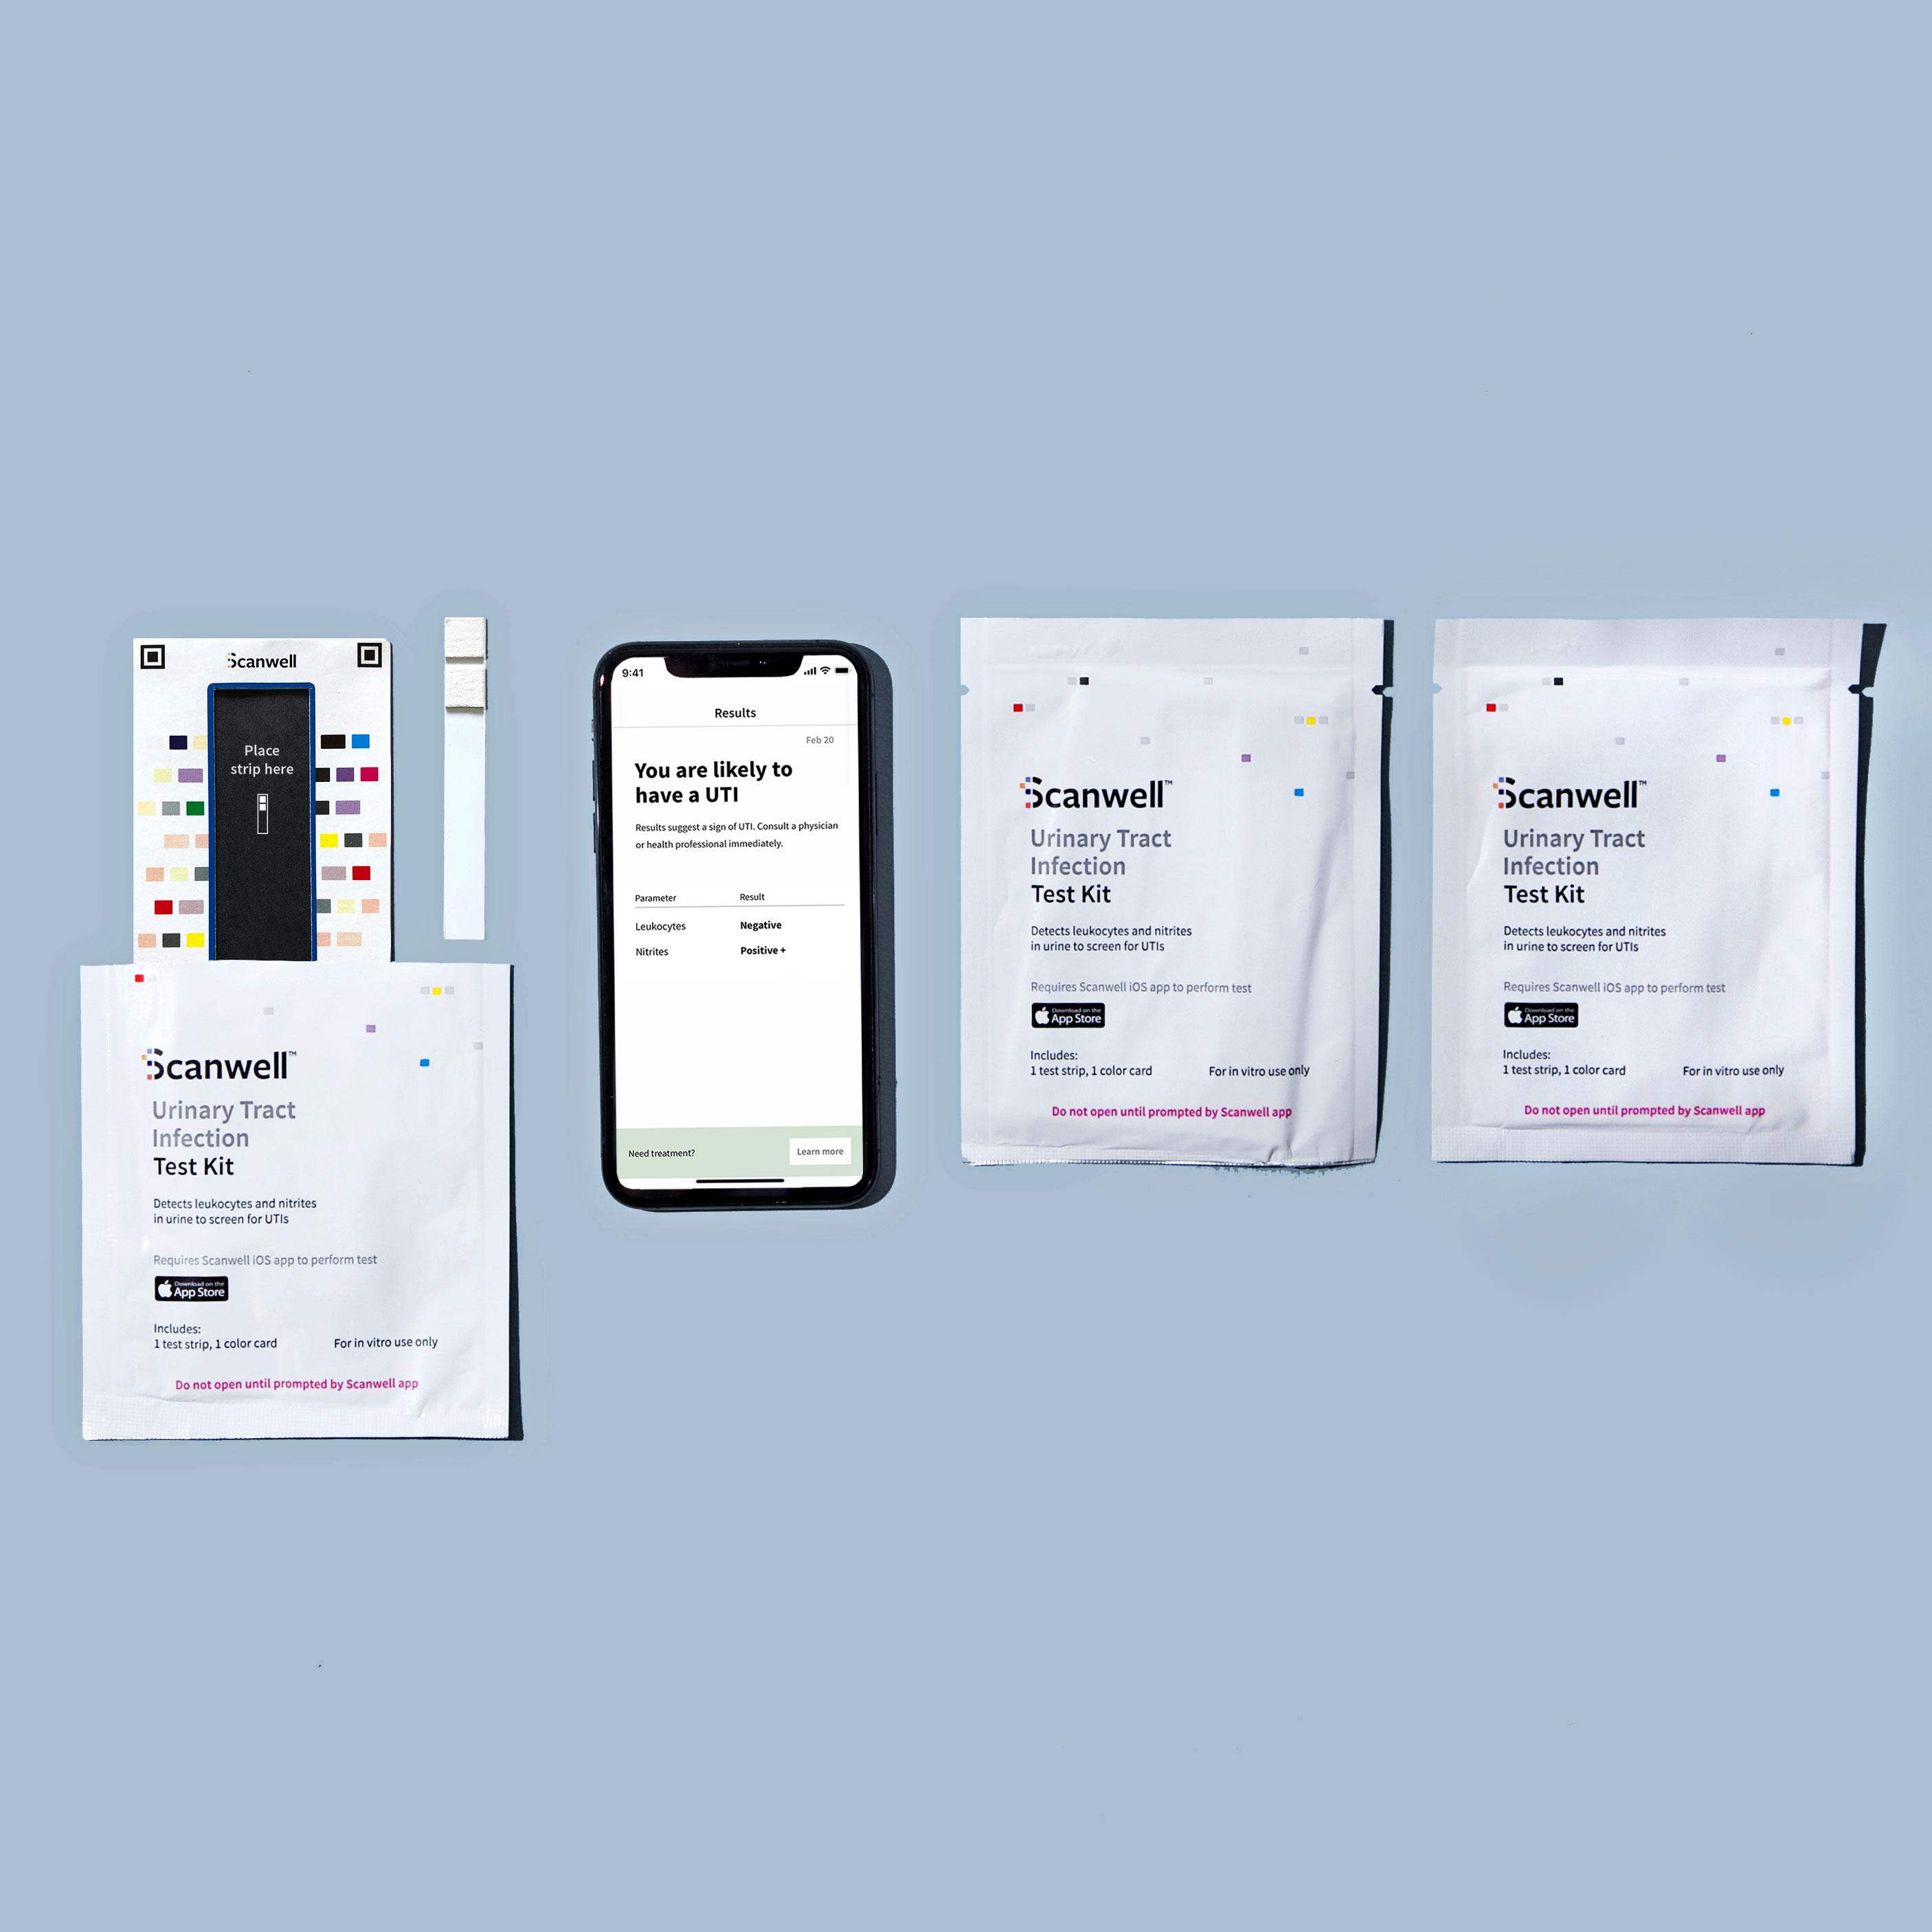 Scanwell Health запускает тесты смартфонов для ИМП в партнерстве с Lemonaid Health 2020 Techcrunch